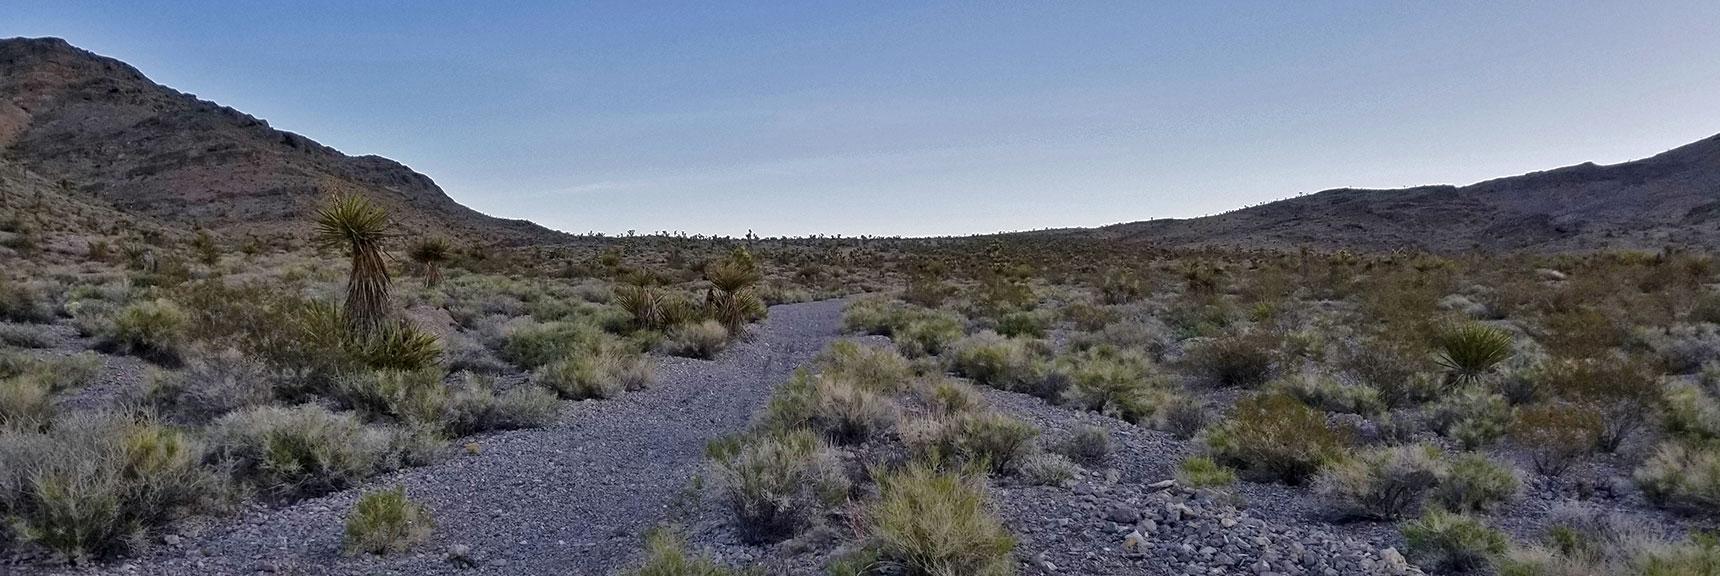 Rising Through the Castle Rock/Gass Peak Pass | Gass Peak Eastern Summit Ultra-marathon Adventure, Nevada